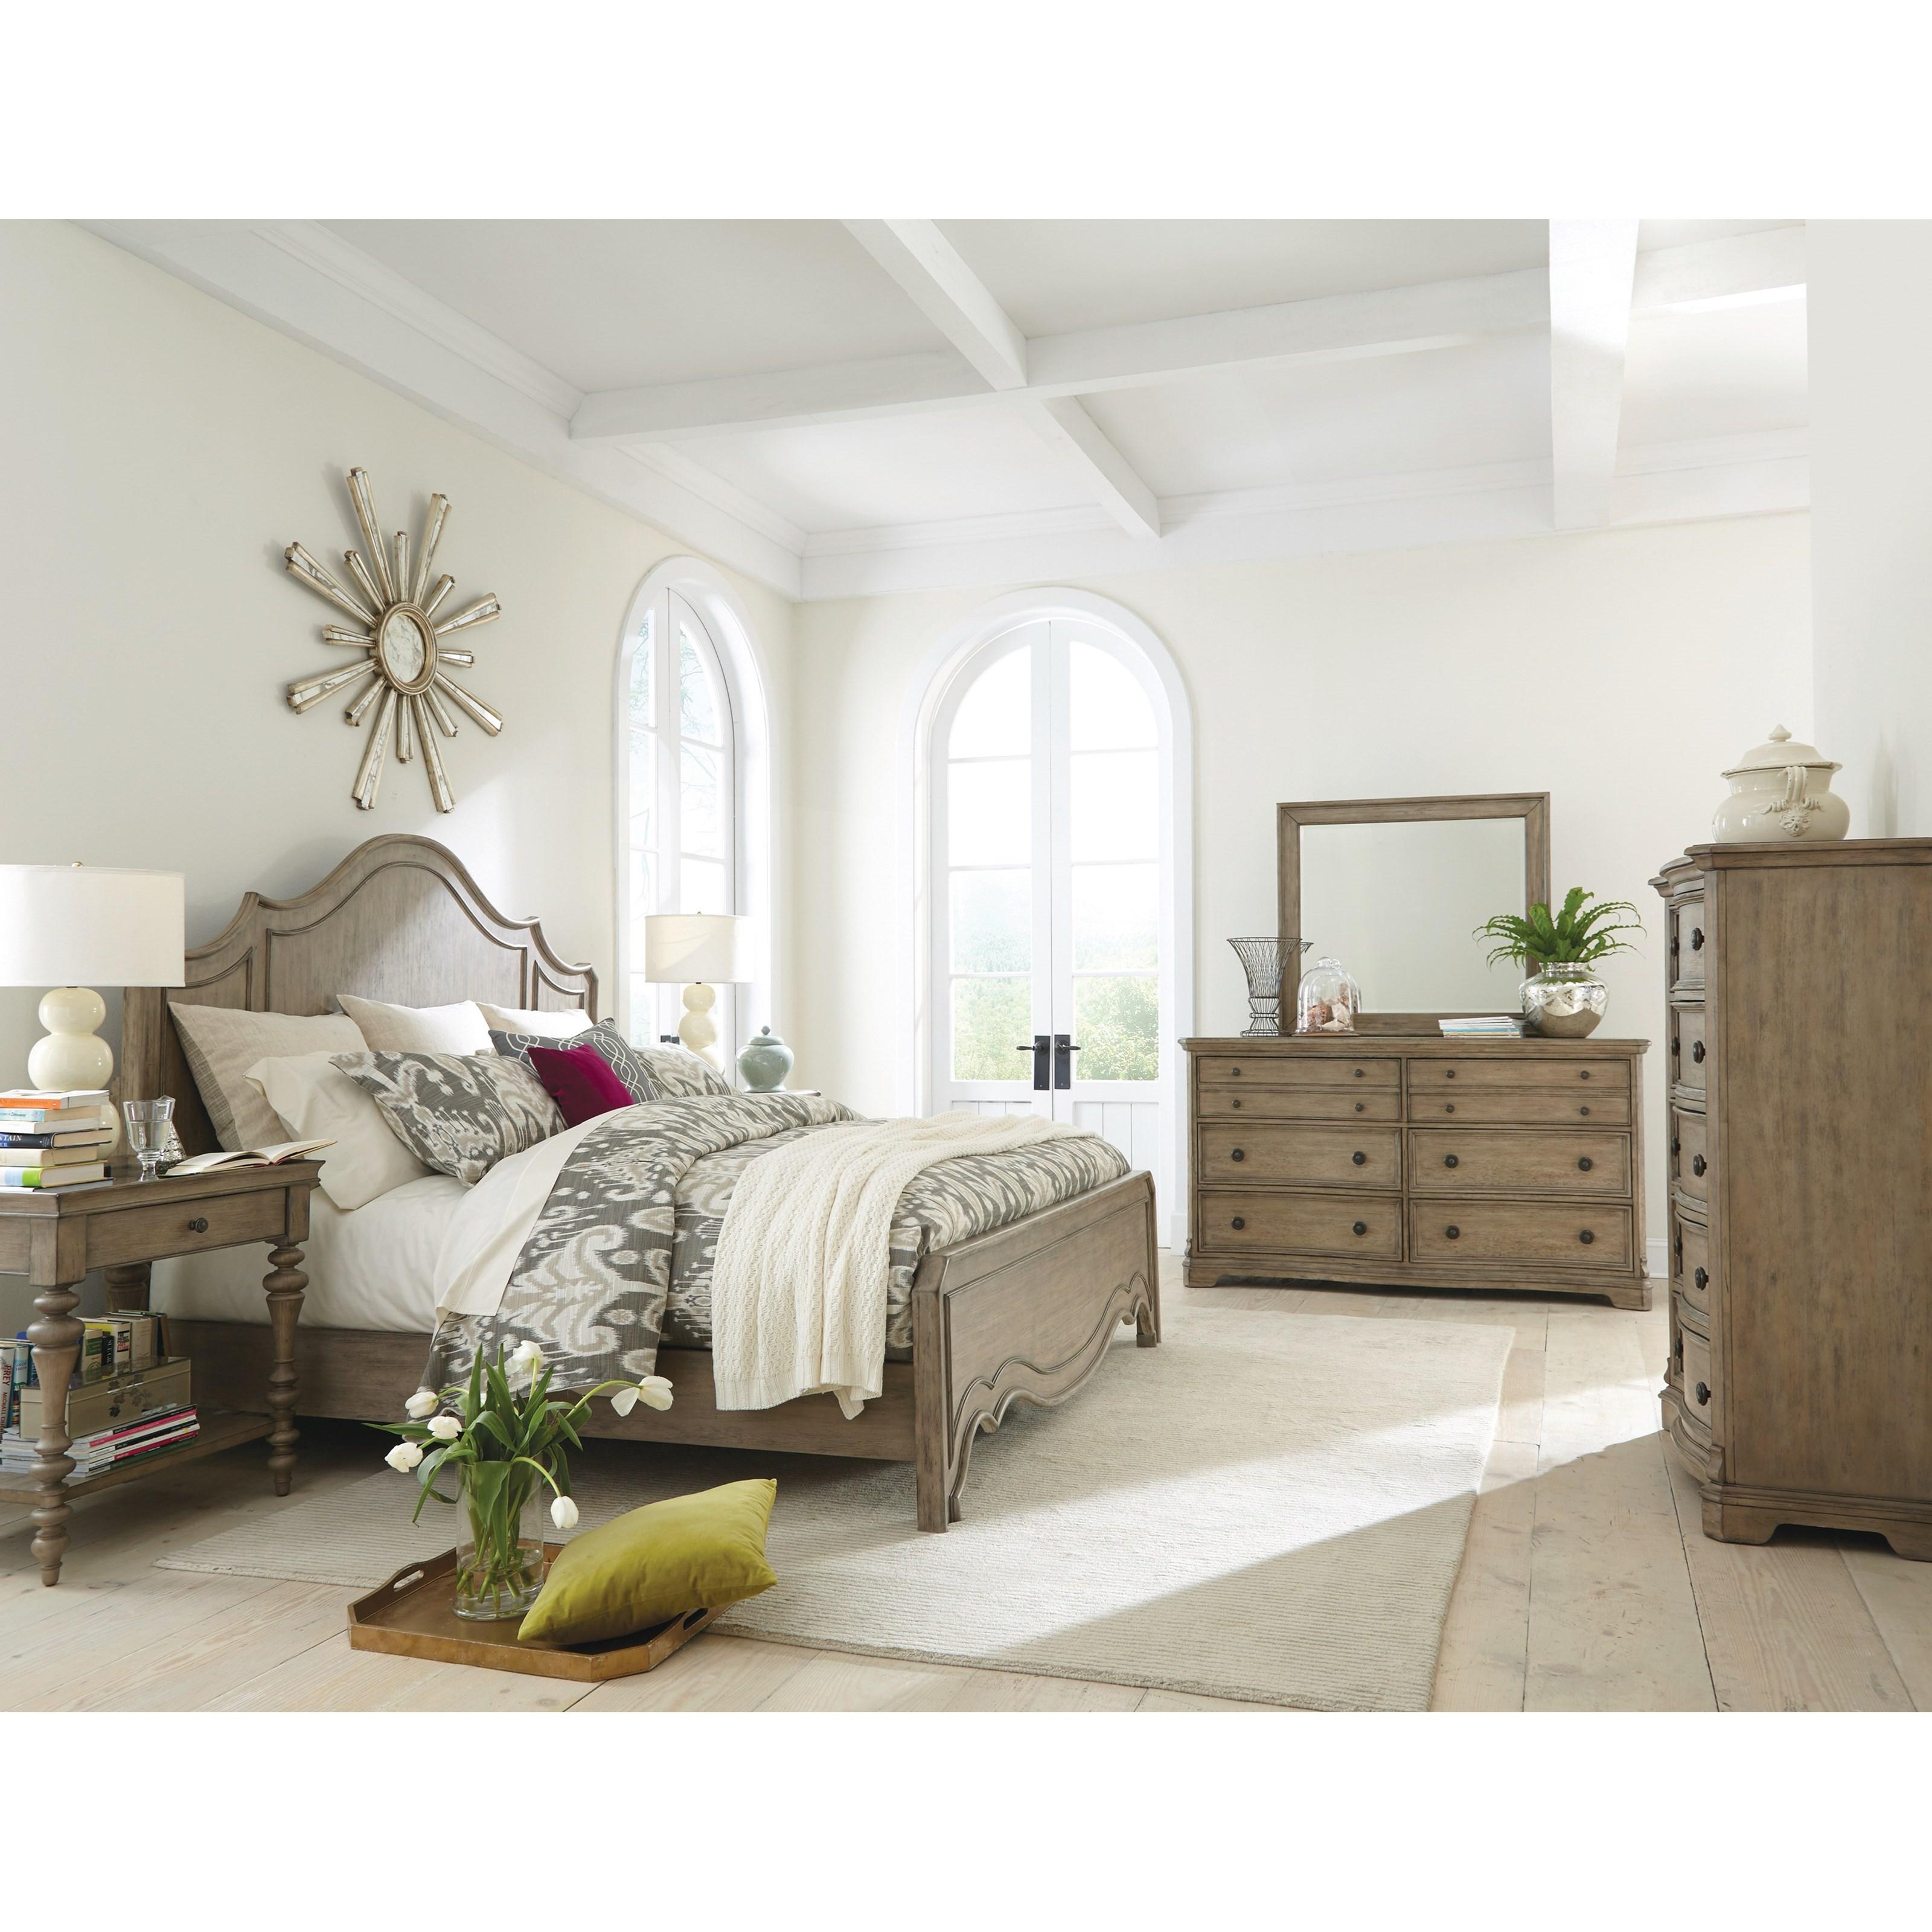 Corinne King Bedroom Group 1 by Riverside Furniture at Mueller Furniture